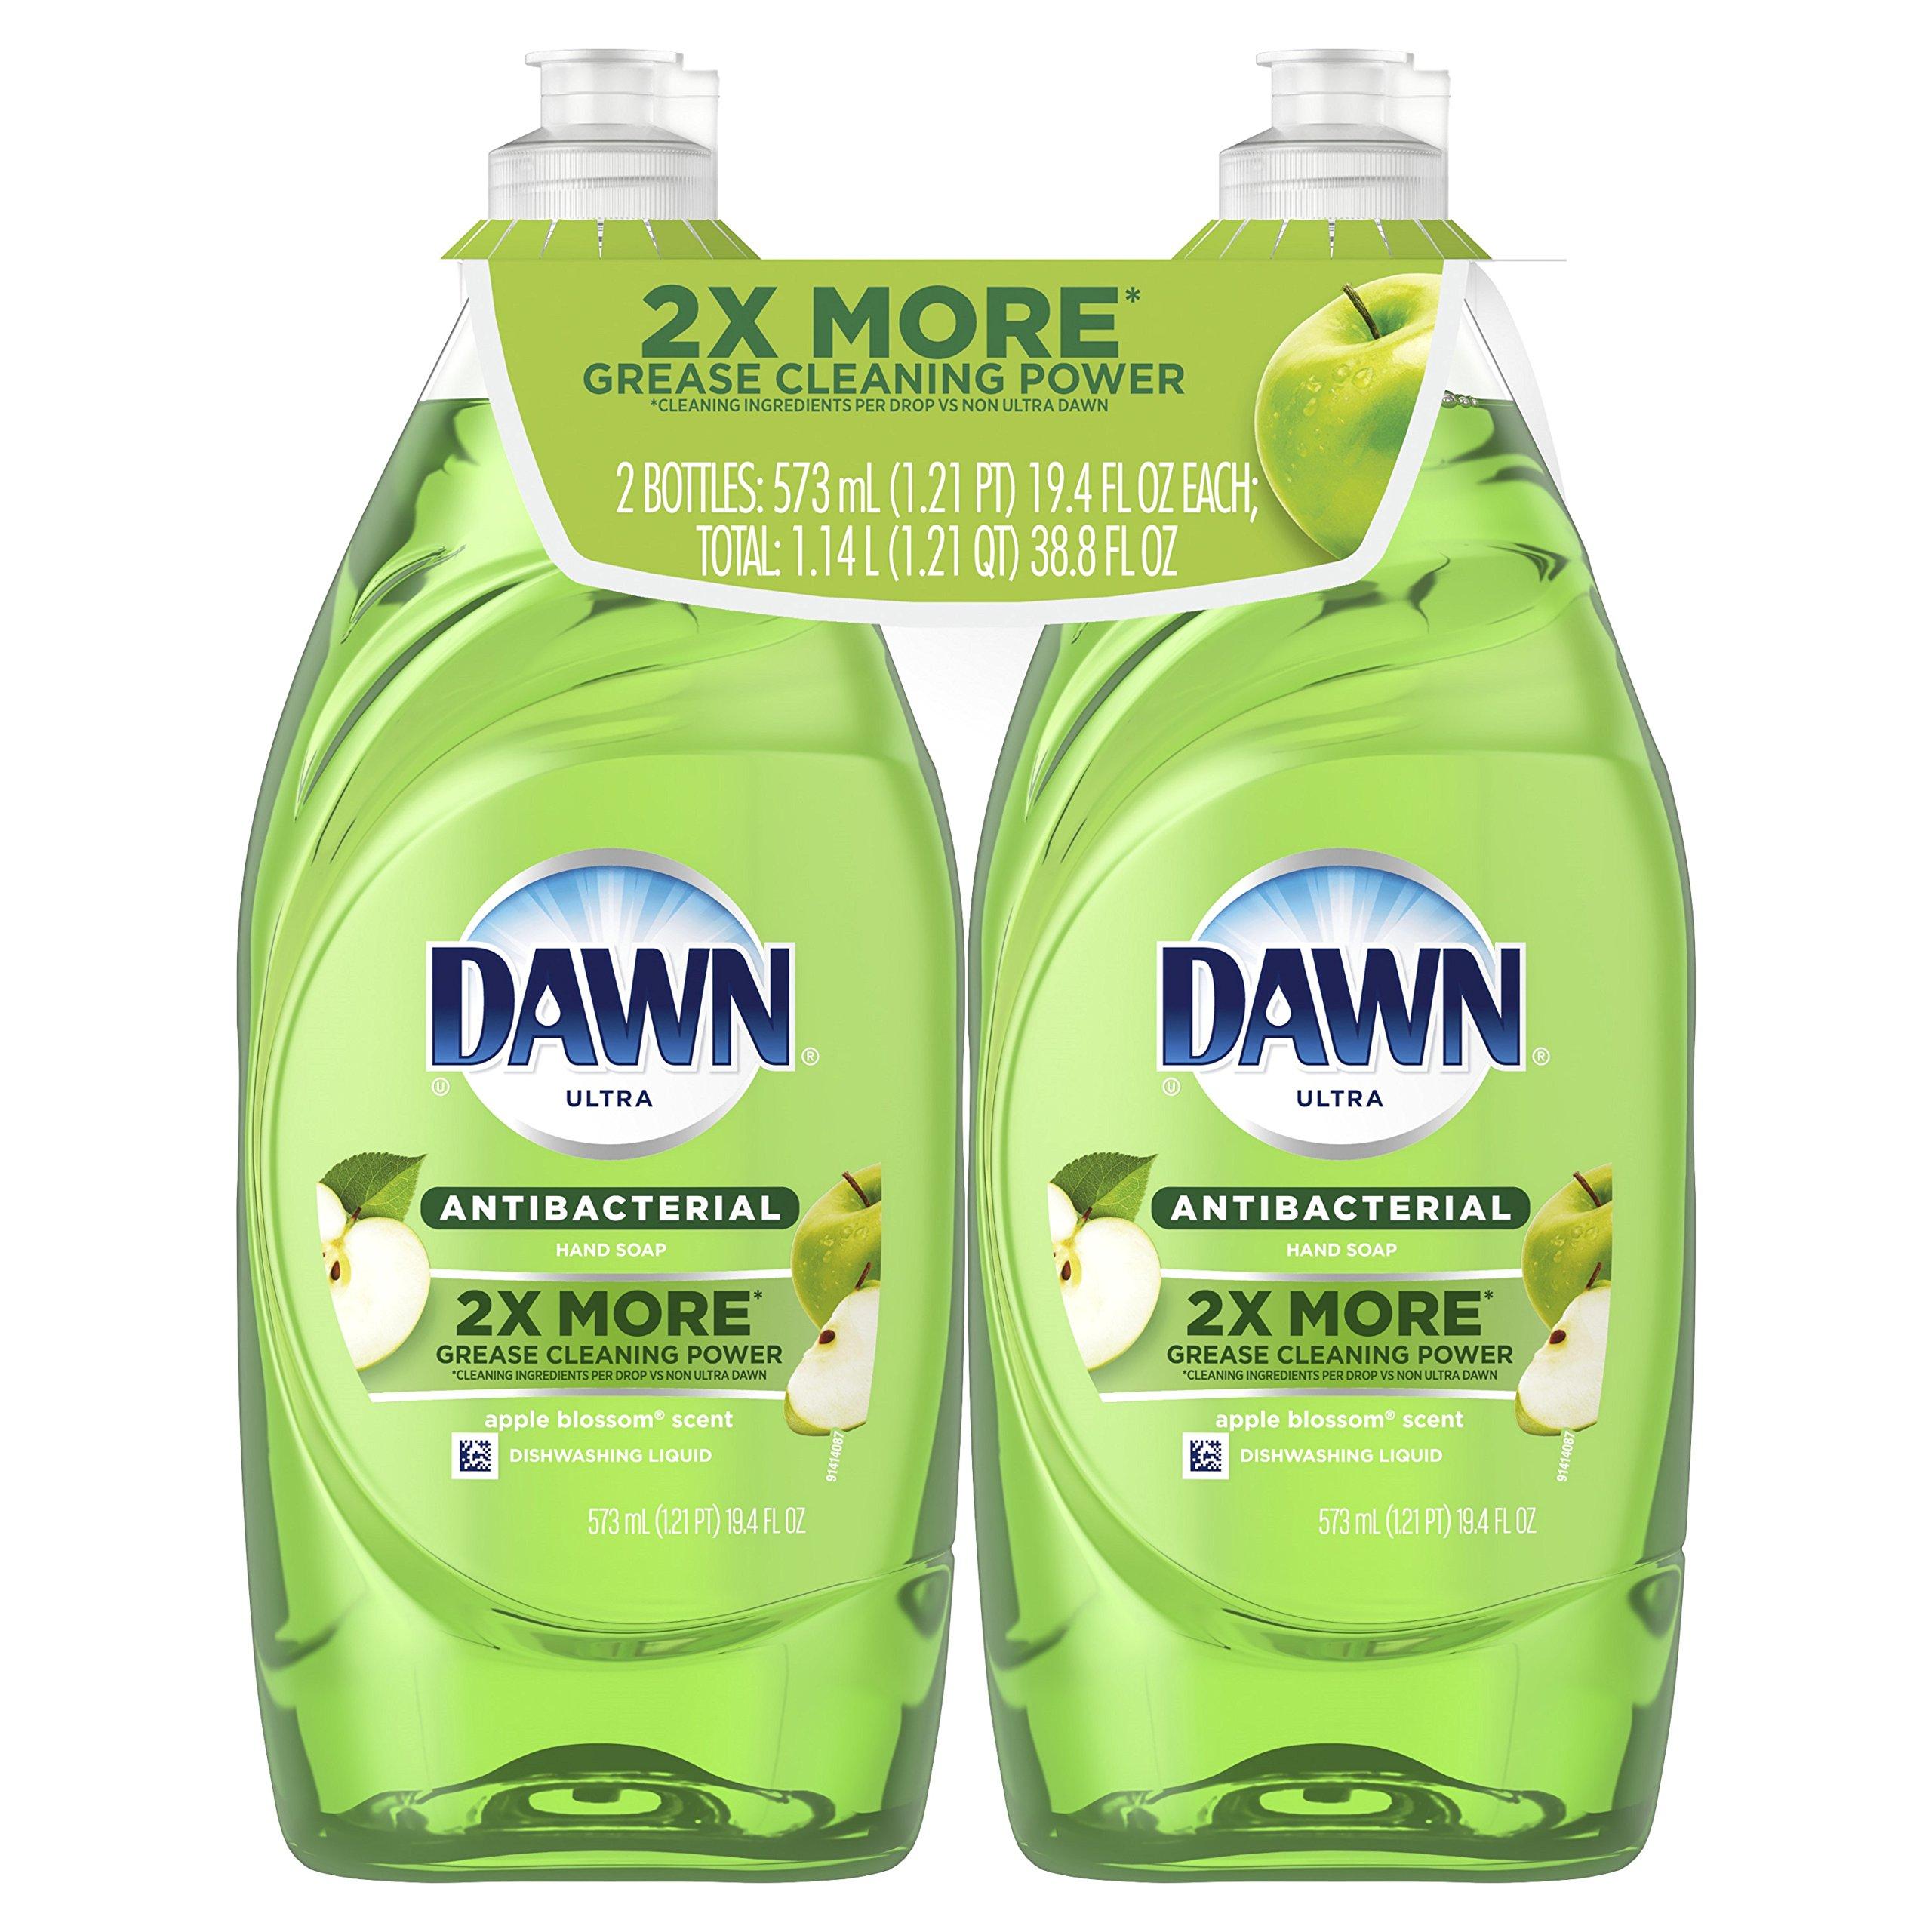 Dawn Ultra Antibacterial Dishwashing Liquid, Apple Blossom, 19.4 Fl Oz, 2 Count